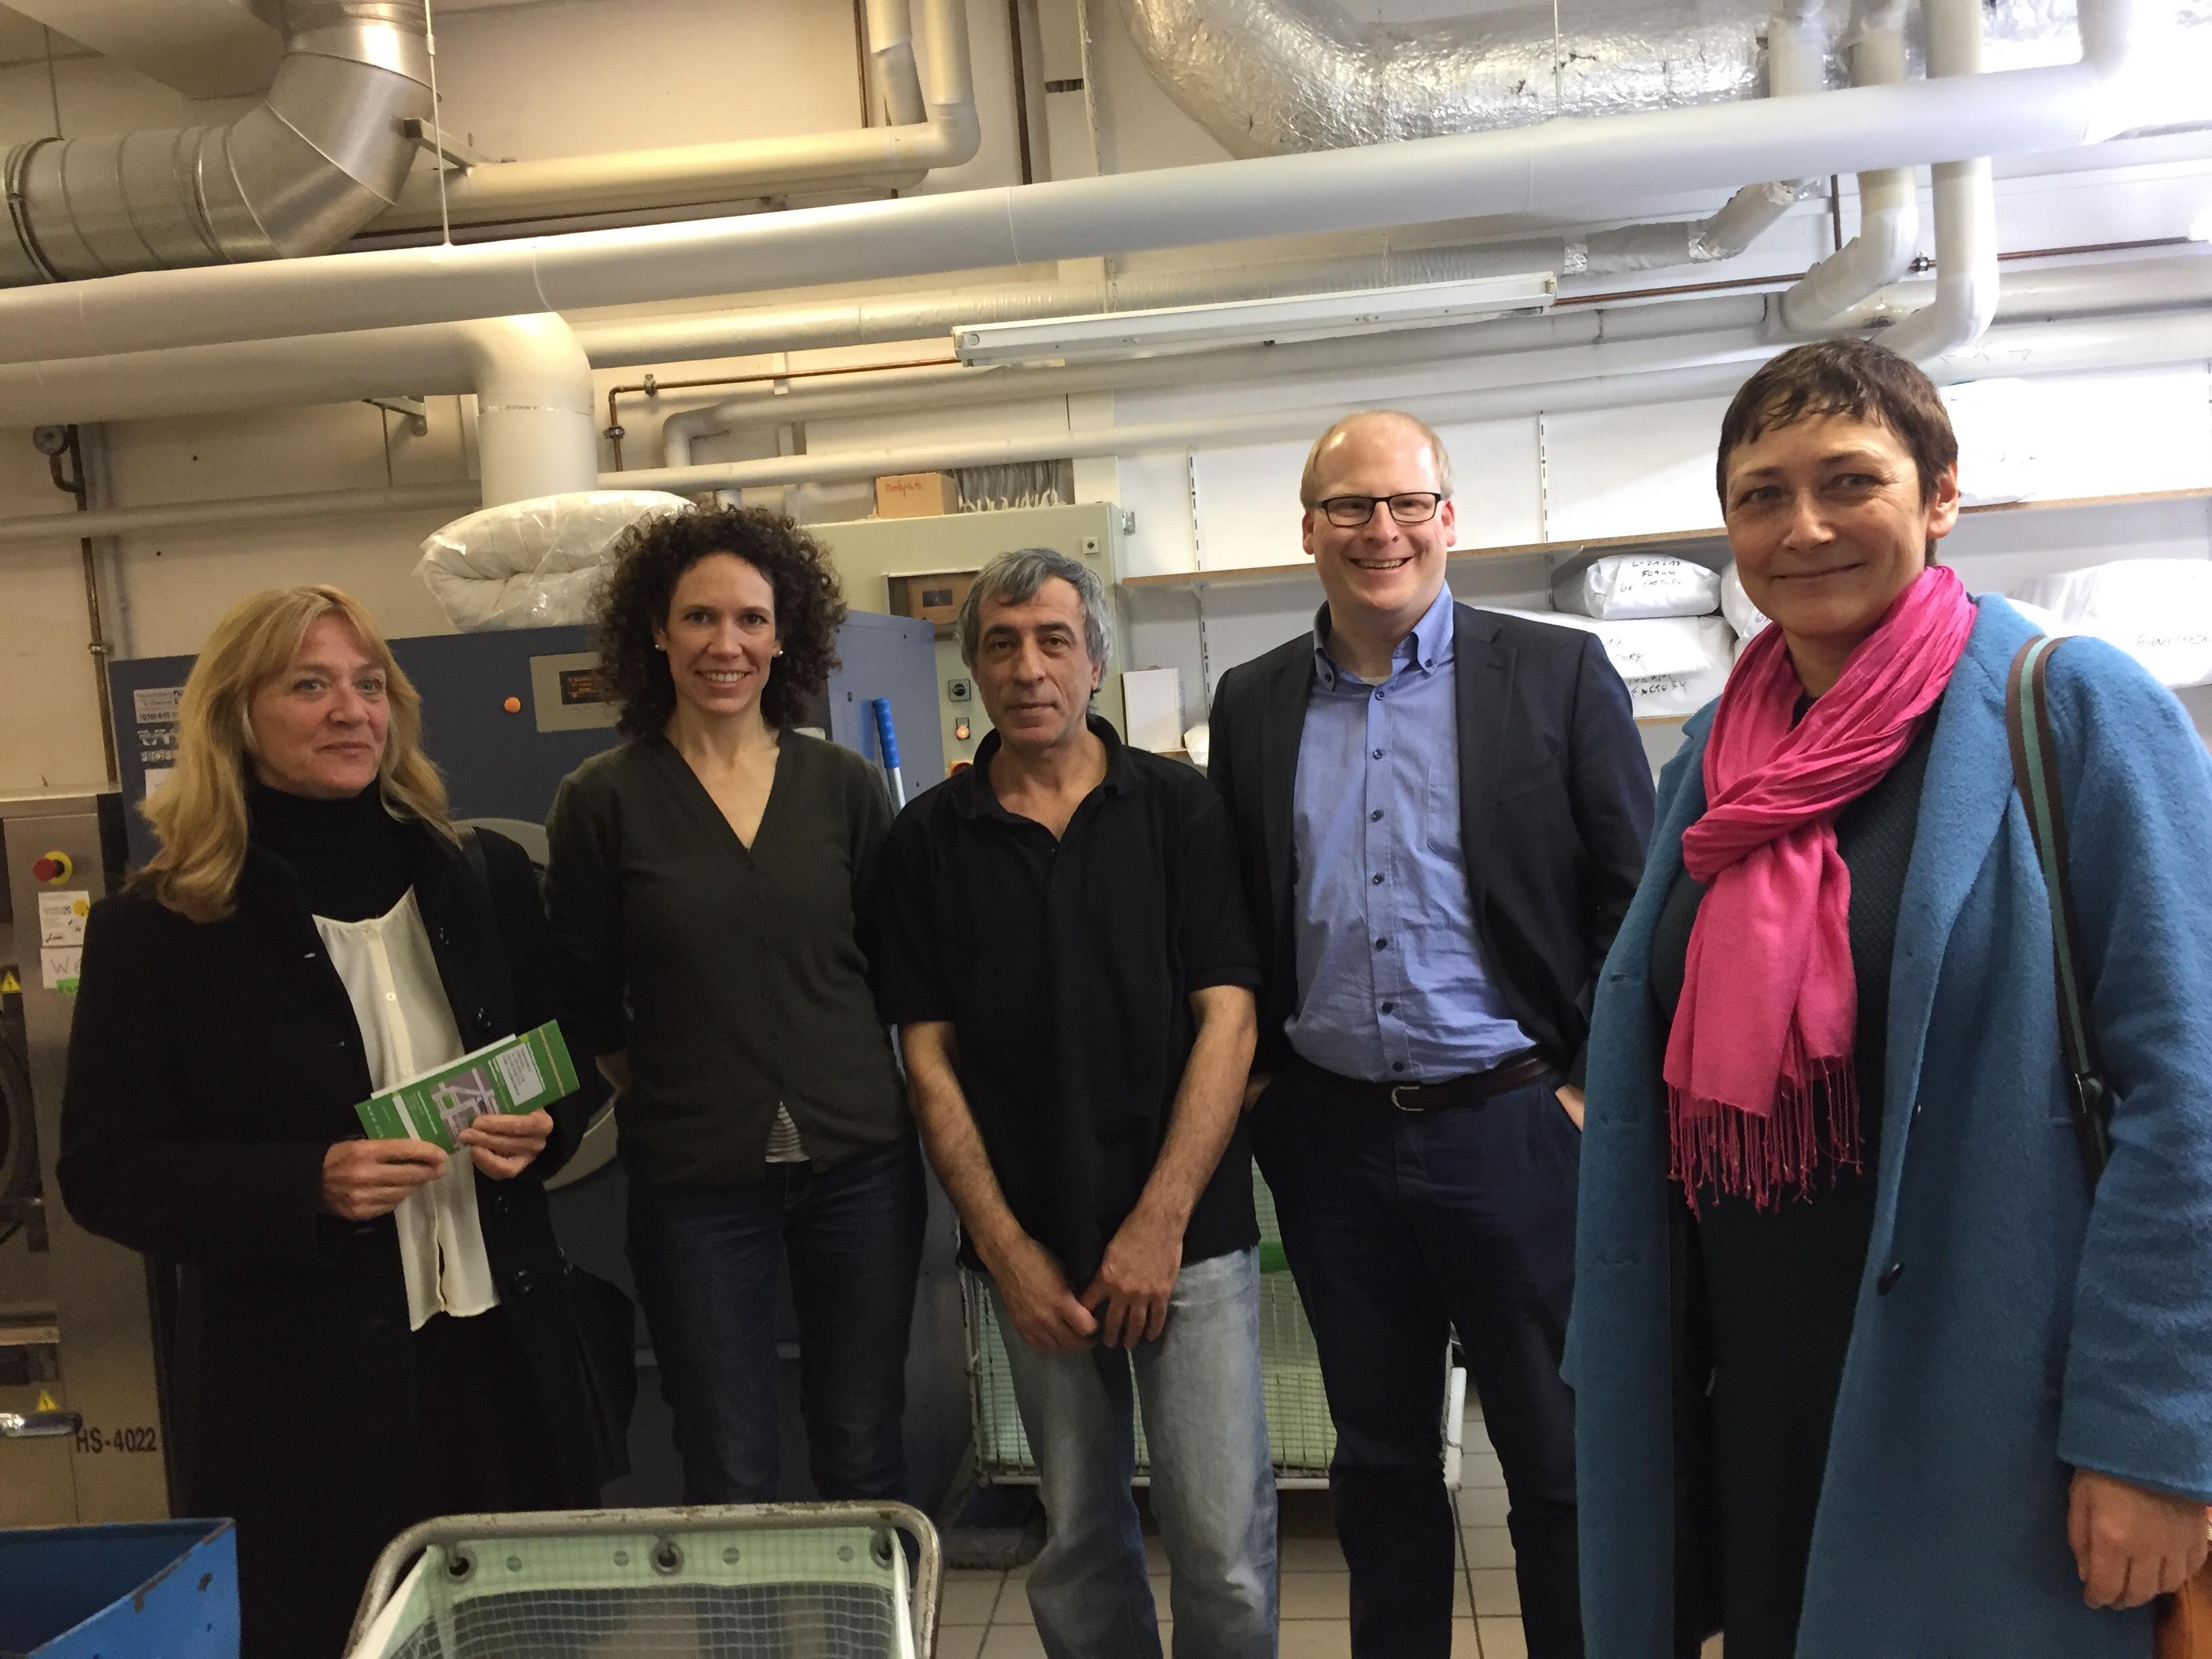 Inklusionsbetriebe in Kreuzberg besucht